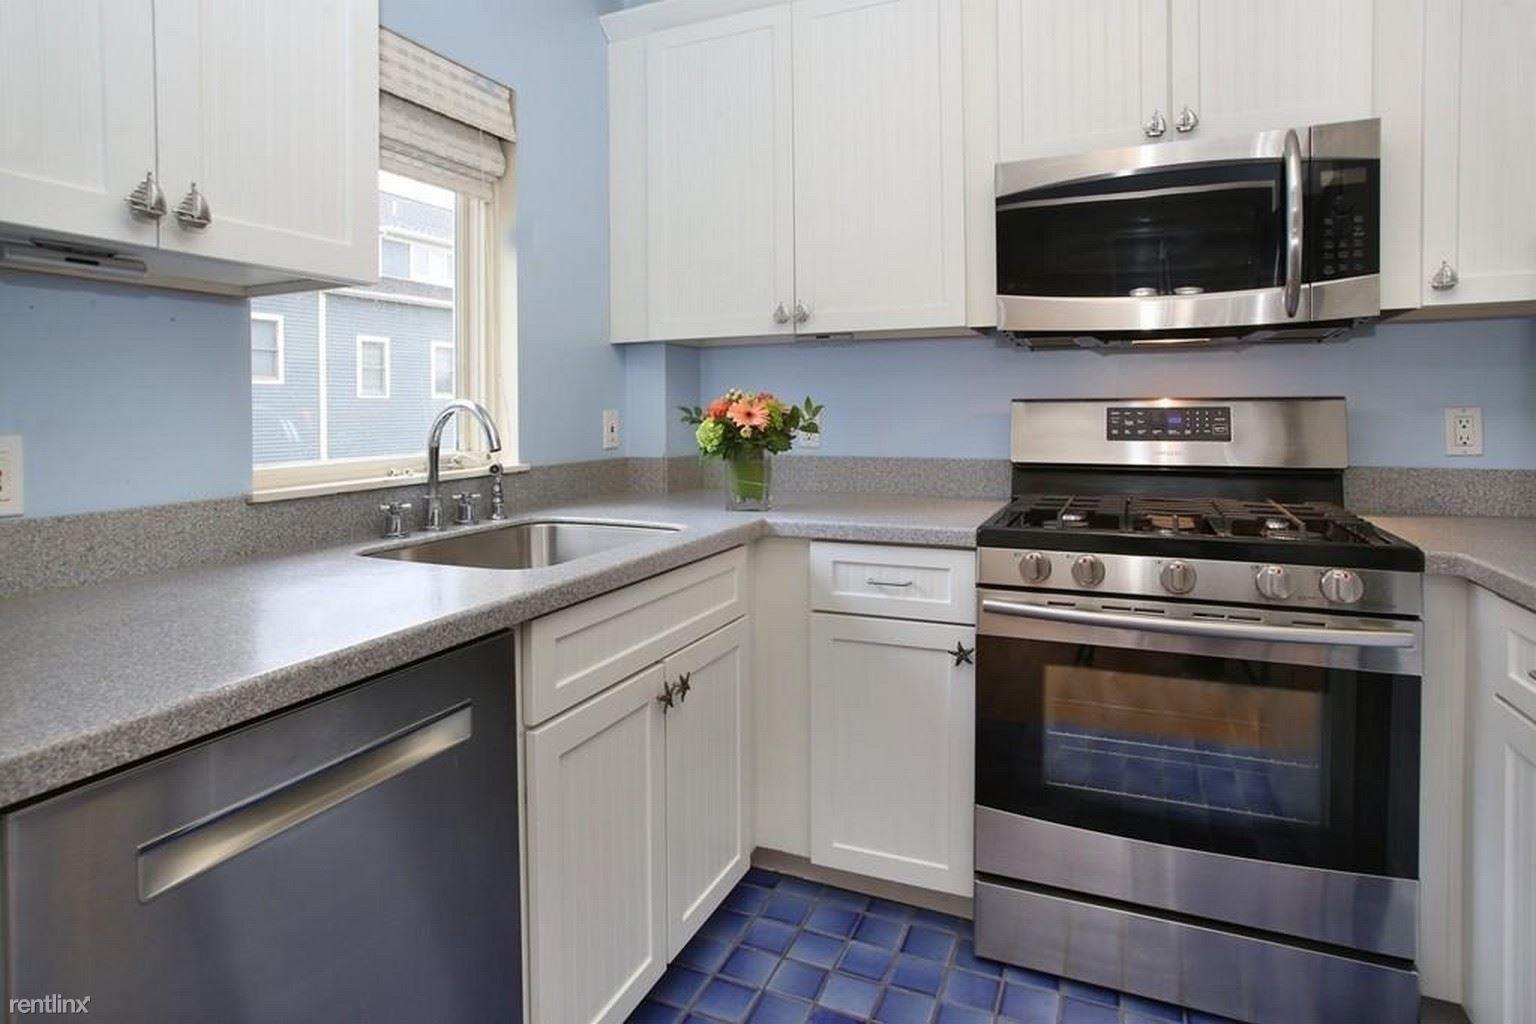 25 N Mead St, Boston, MA - $1,000